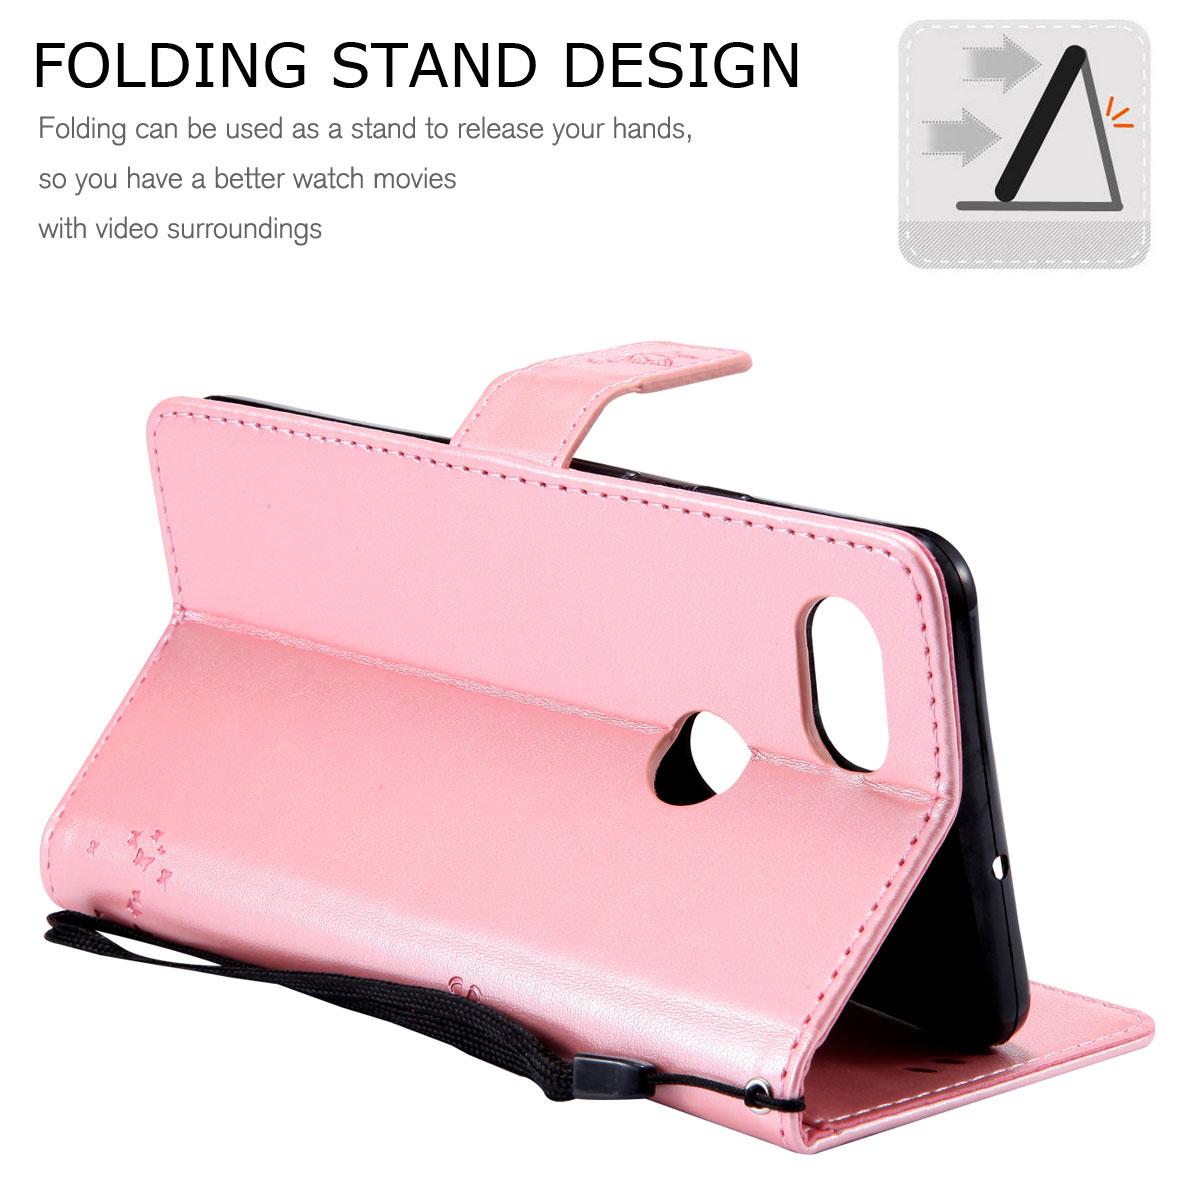 Magnetic-Leather-Credit-Card-Holder-Flip-Case-Cover-For-Google-Pixel-2-2-XL thumbnail 92